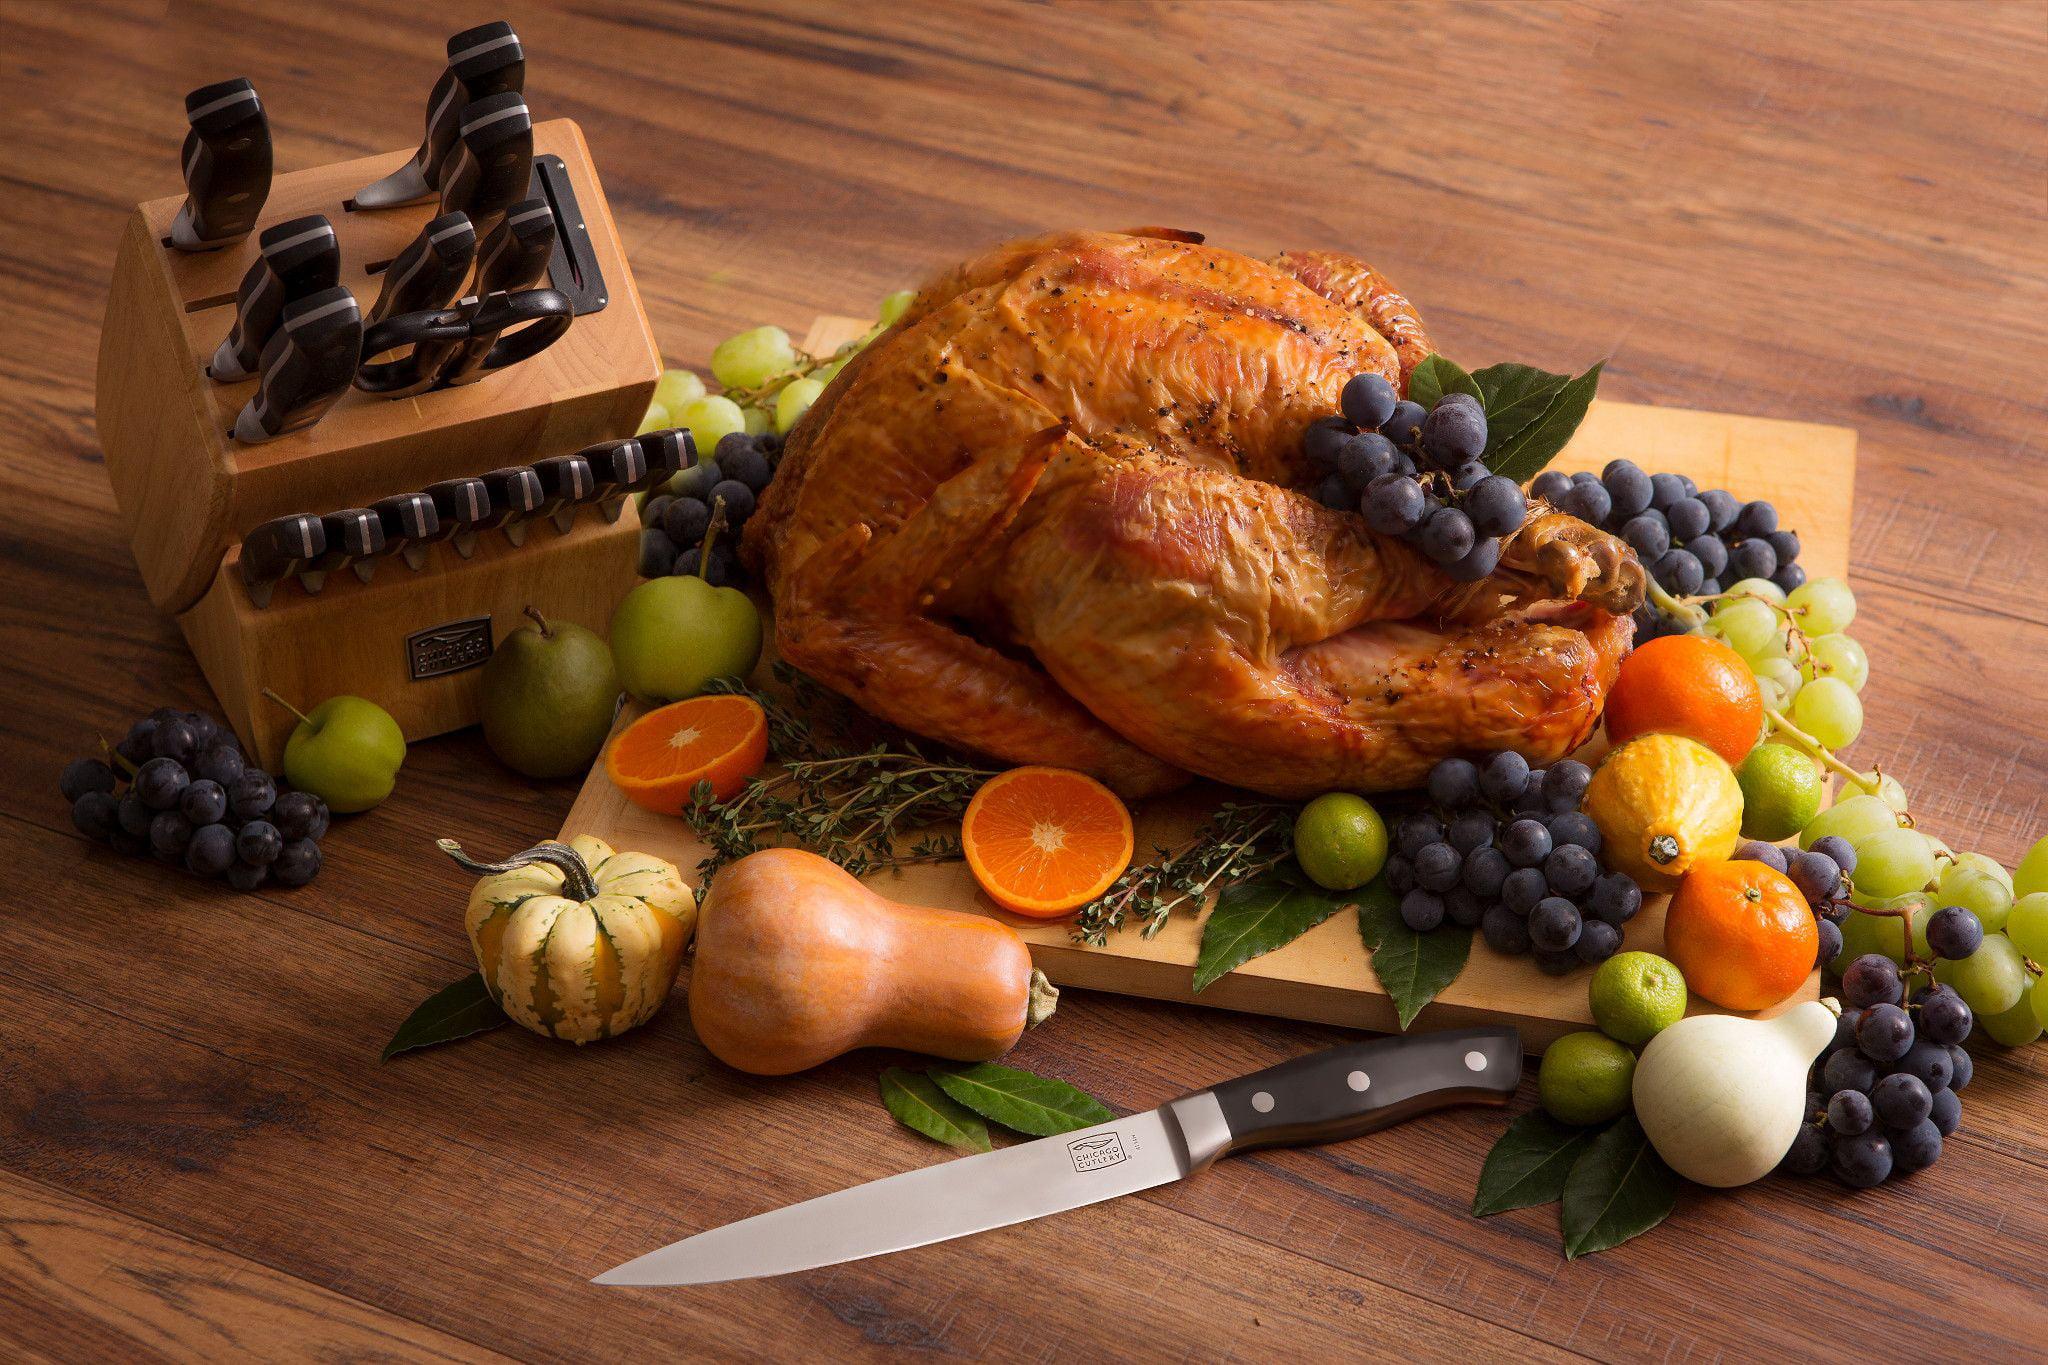 Chicago Cutlery Insignia2 18-Piece Knife Block Set with In-Block Sharpener by World Kitchen LLC